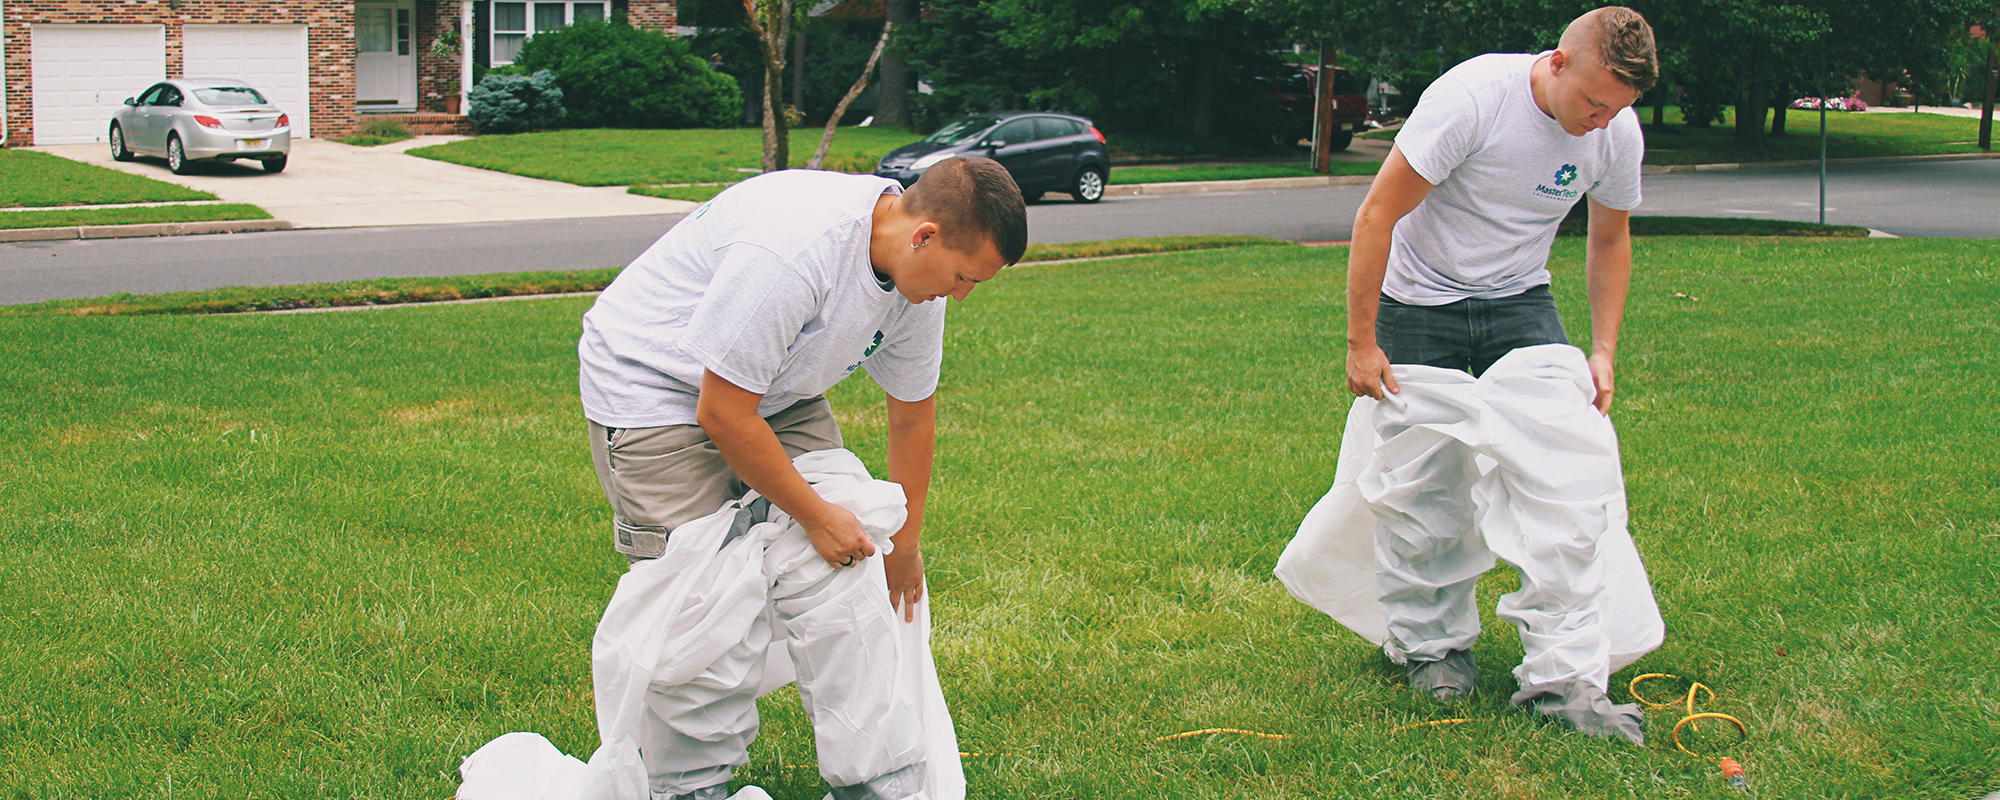 biohazard-cleanup-company-eastern-pa